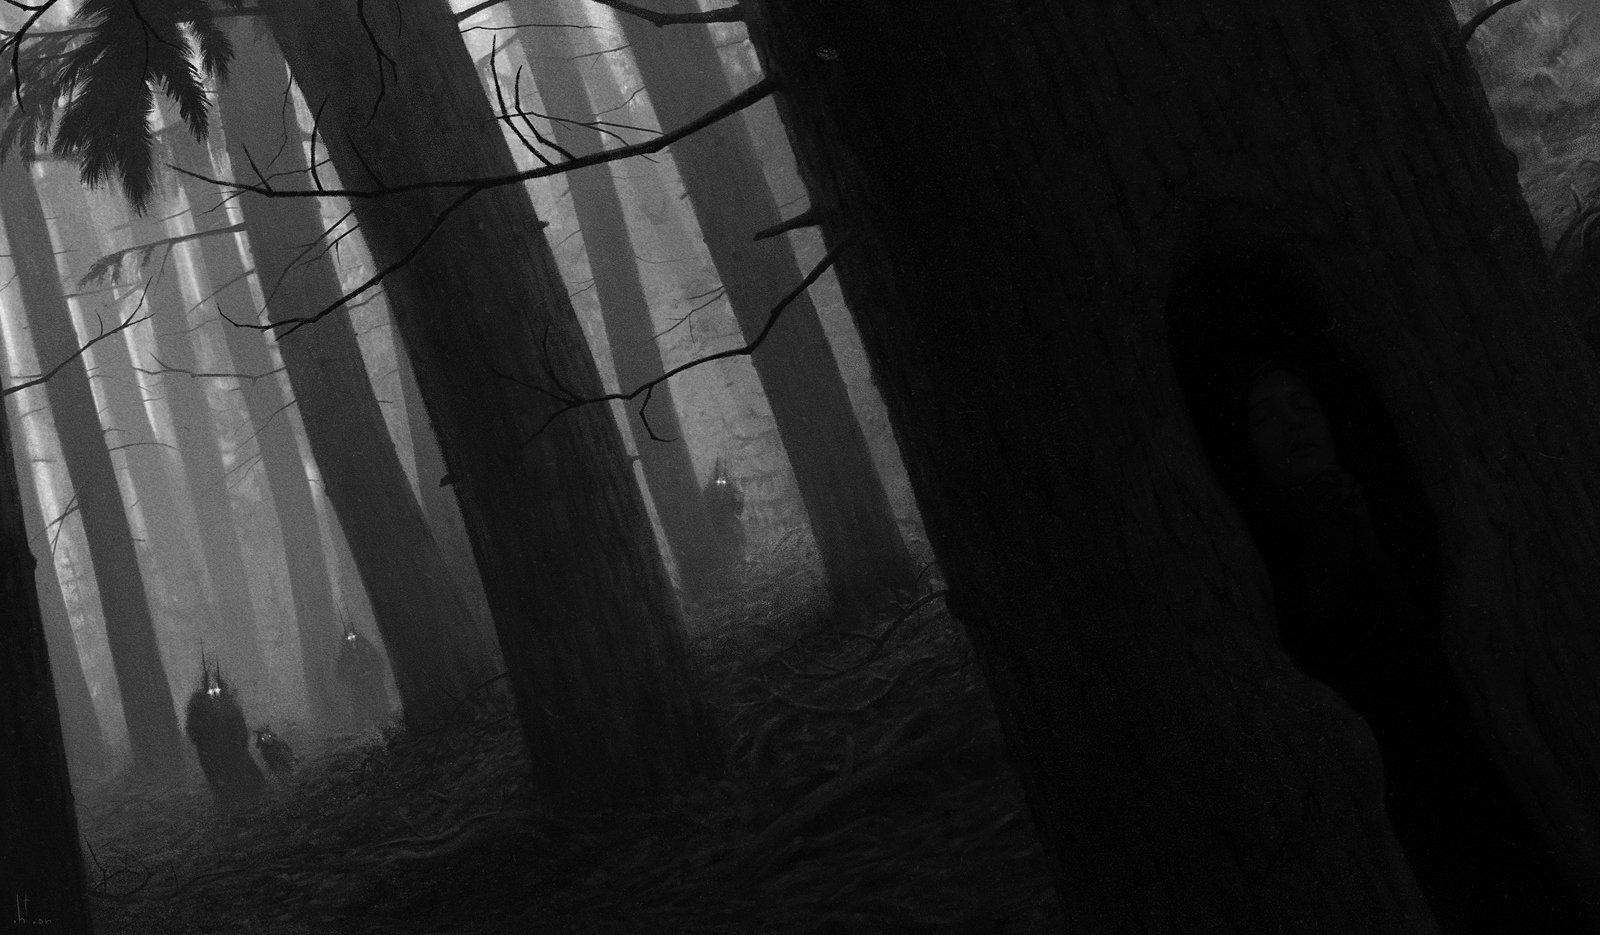 Dark scary forest wallpaper wallpapersafari - Dark horror creepy wallpapers ...